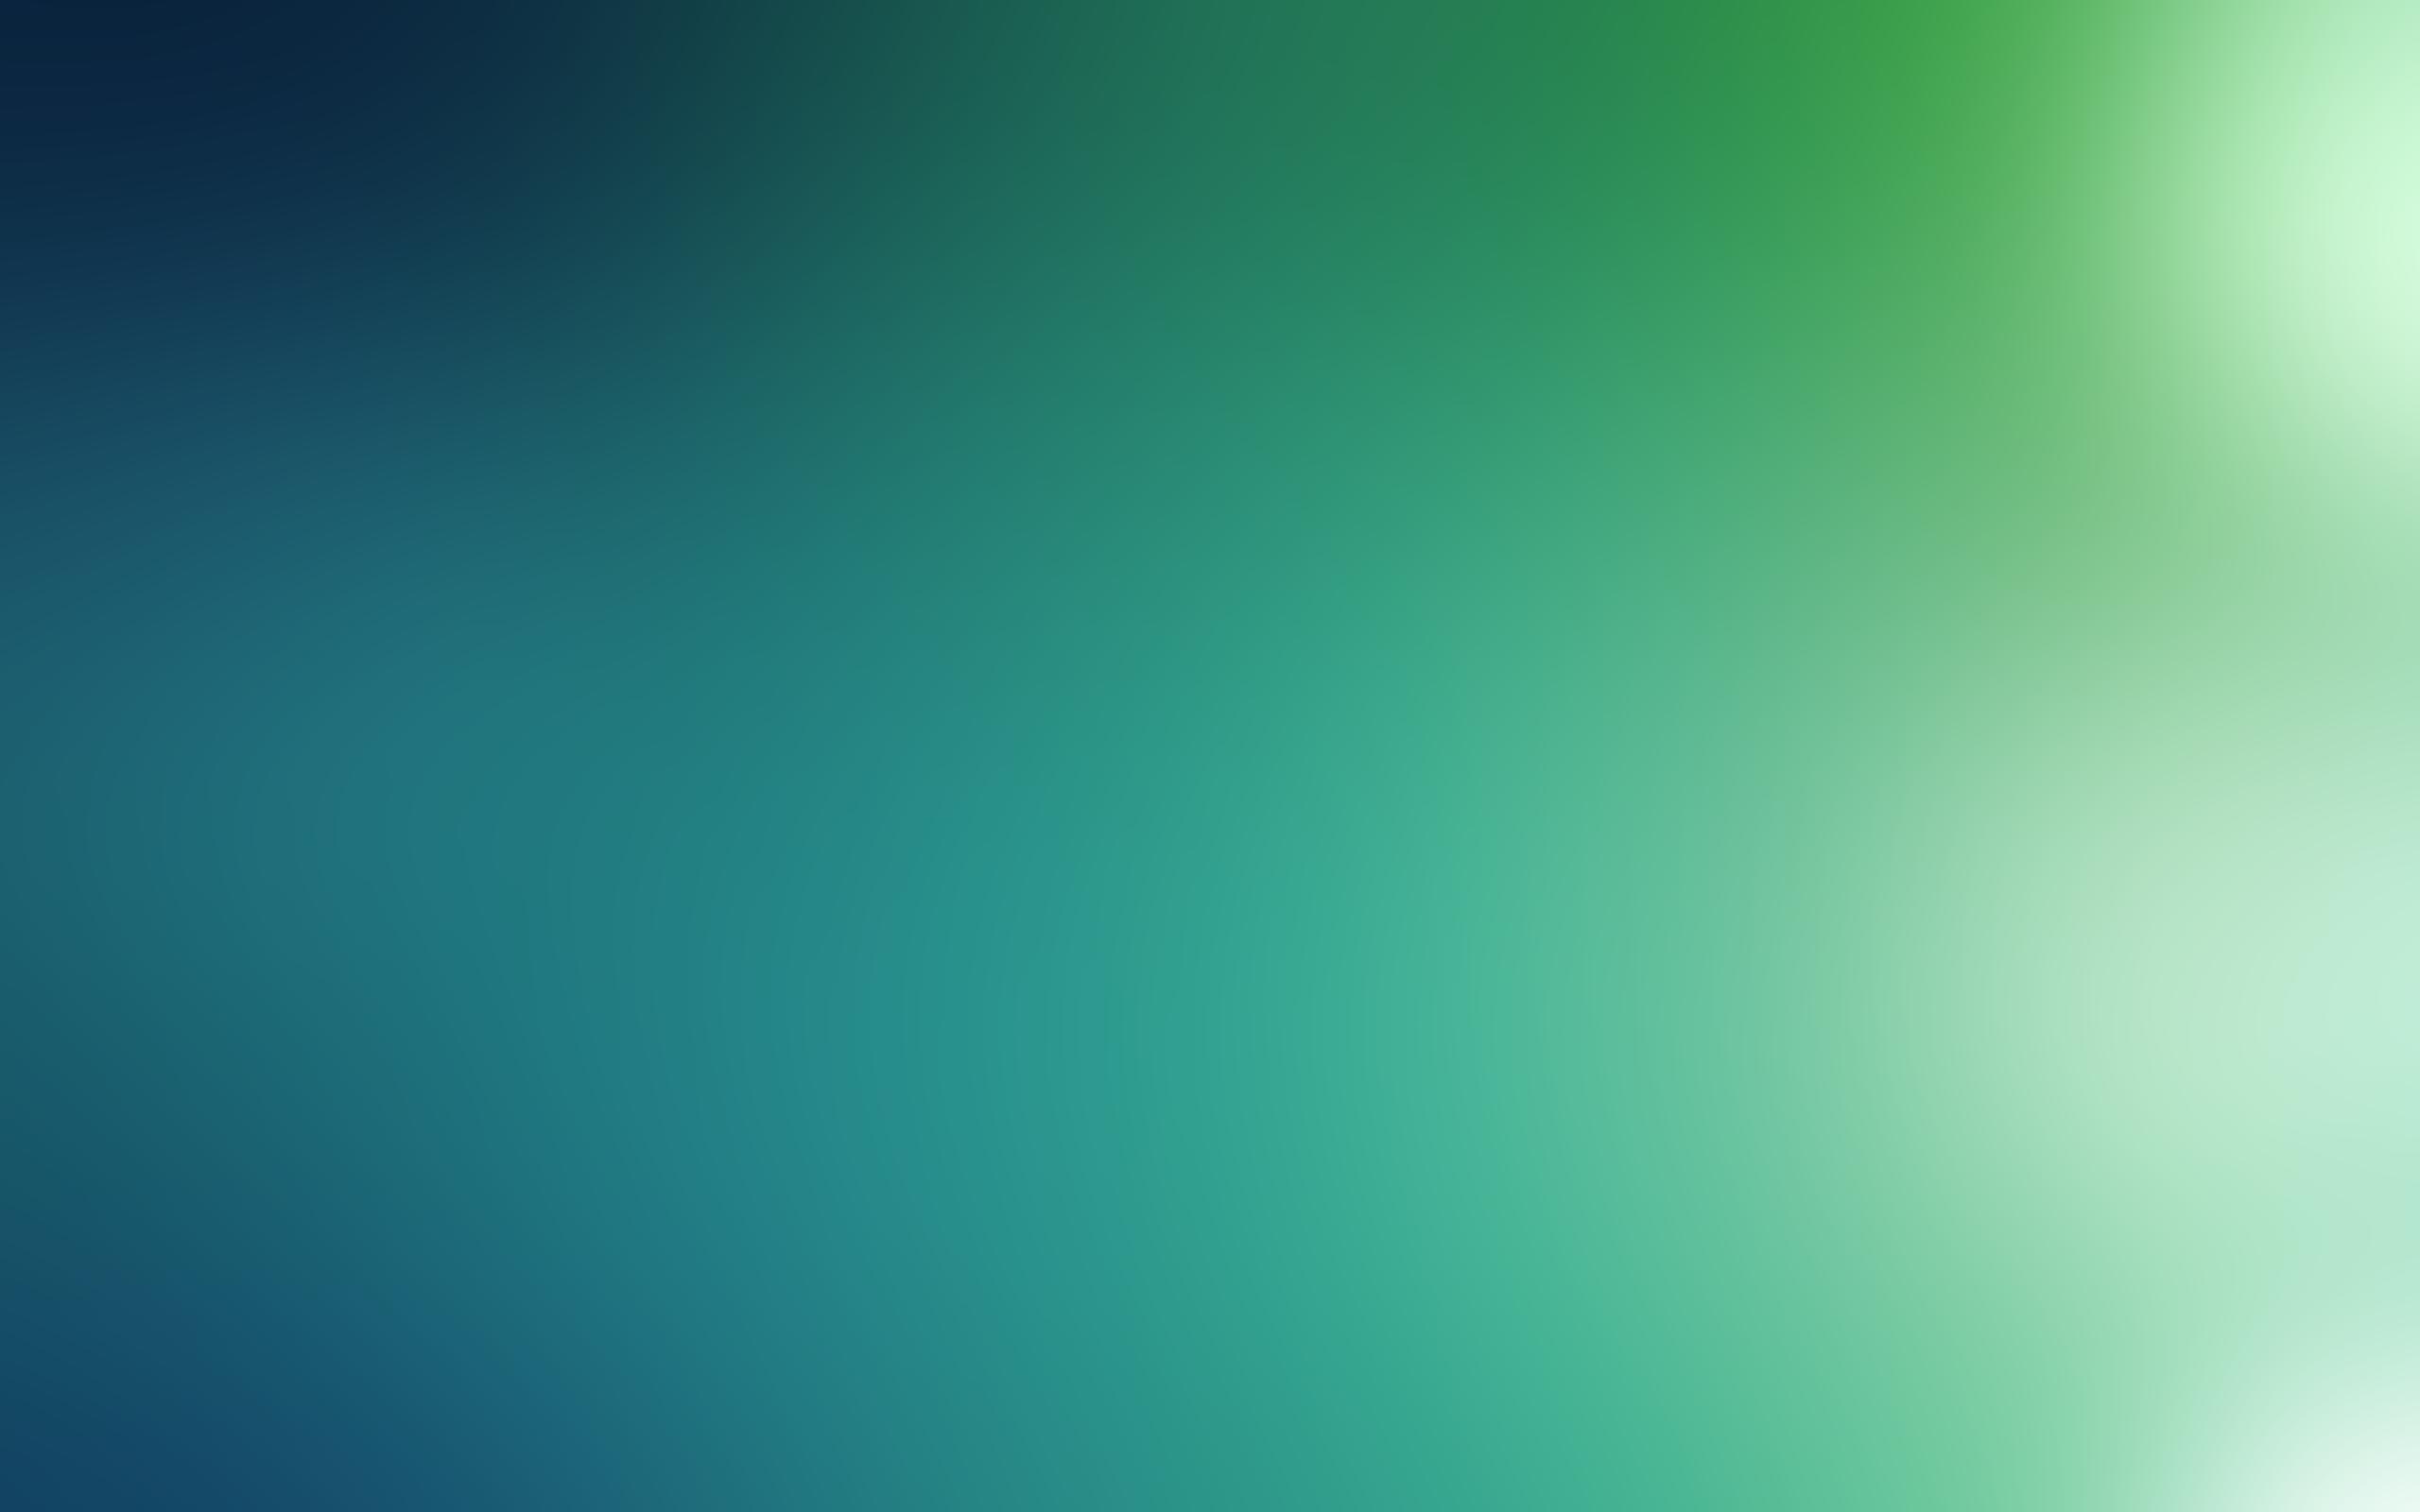 green blue wallpaper hd - photo #18